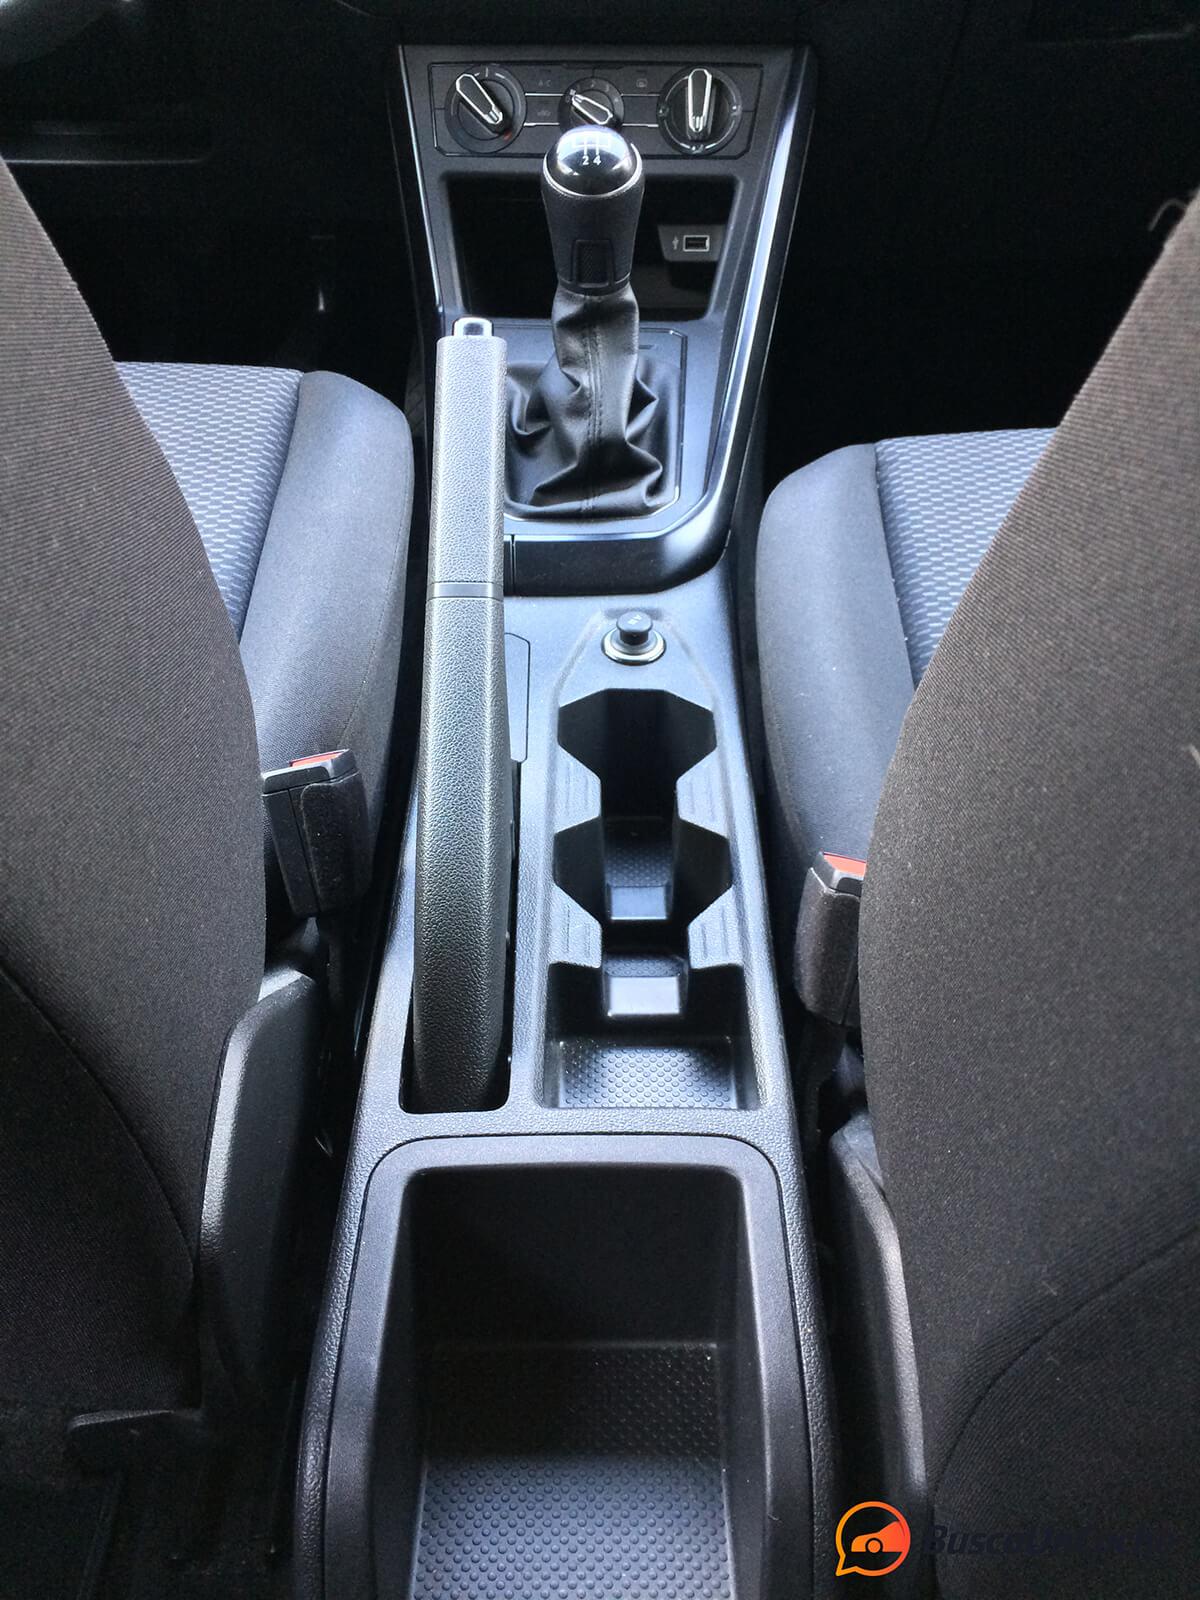 Volkswagen Polo 2018 1.0 EVO: consola central